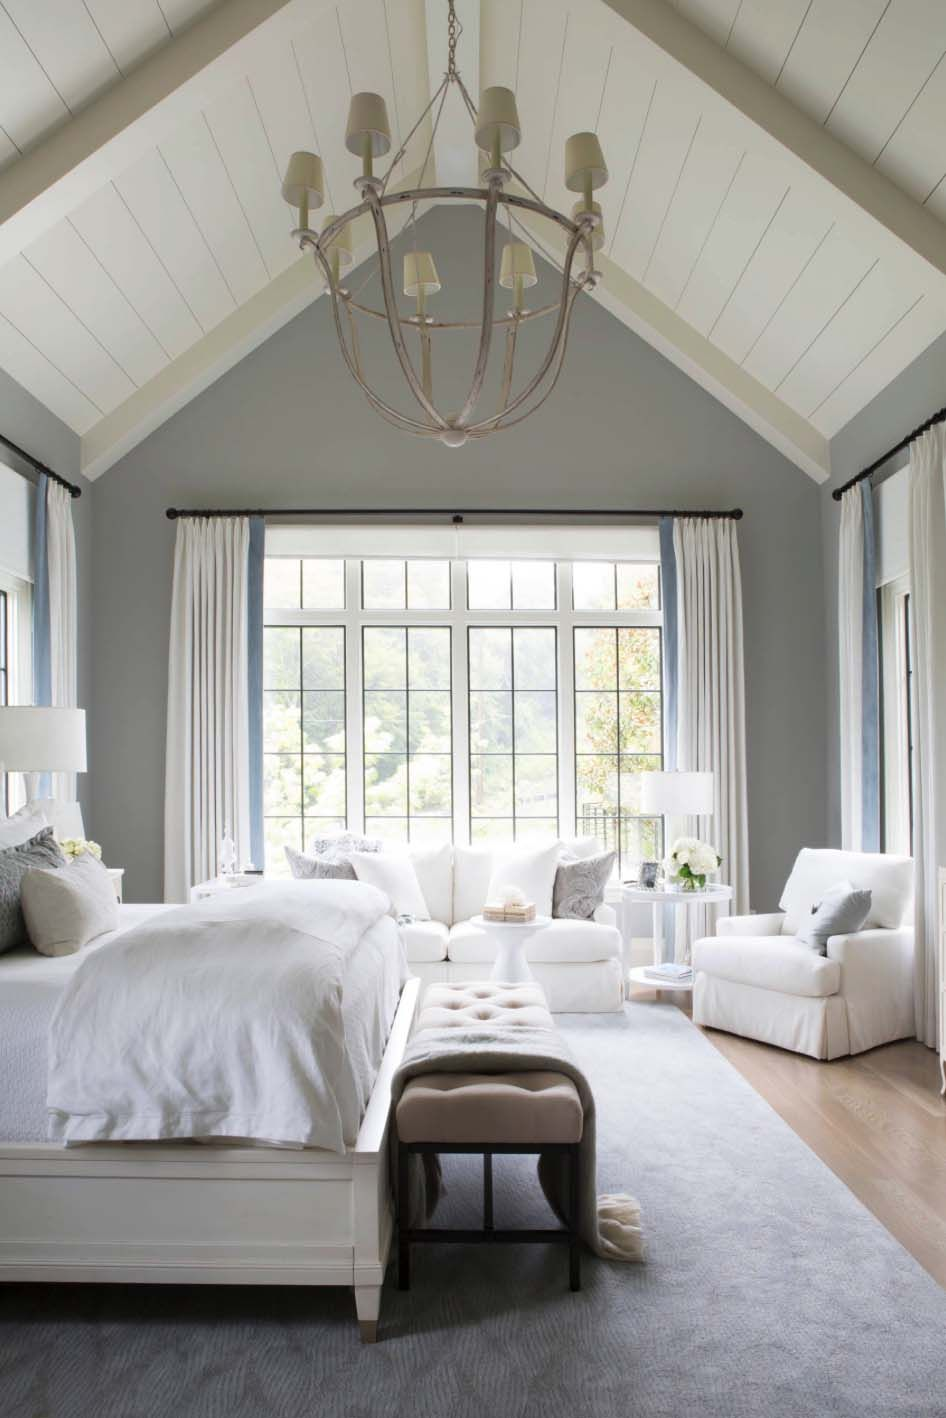 20 Serene And Elegant Master Bedroom Decorating Ideas Large Master Bedroom Ideas White Bedroom Decor Beautiful Bedrooms Master